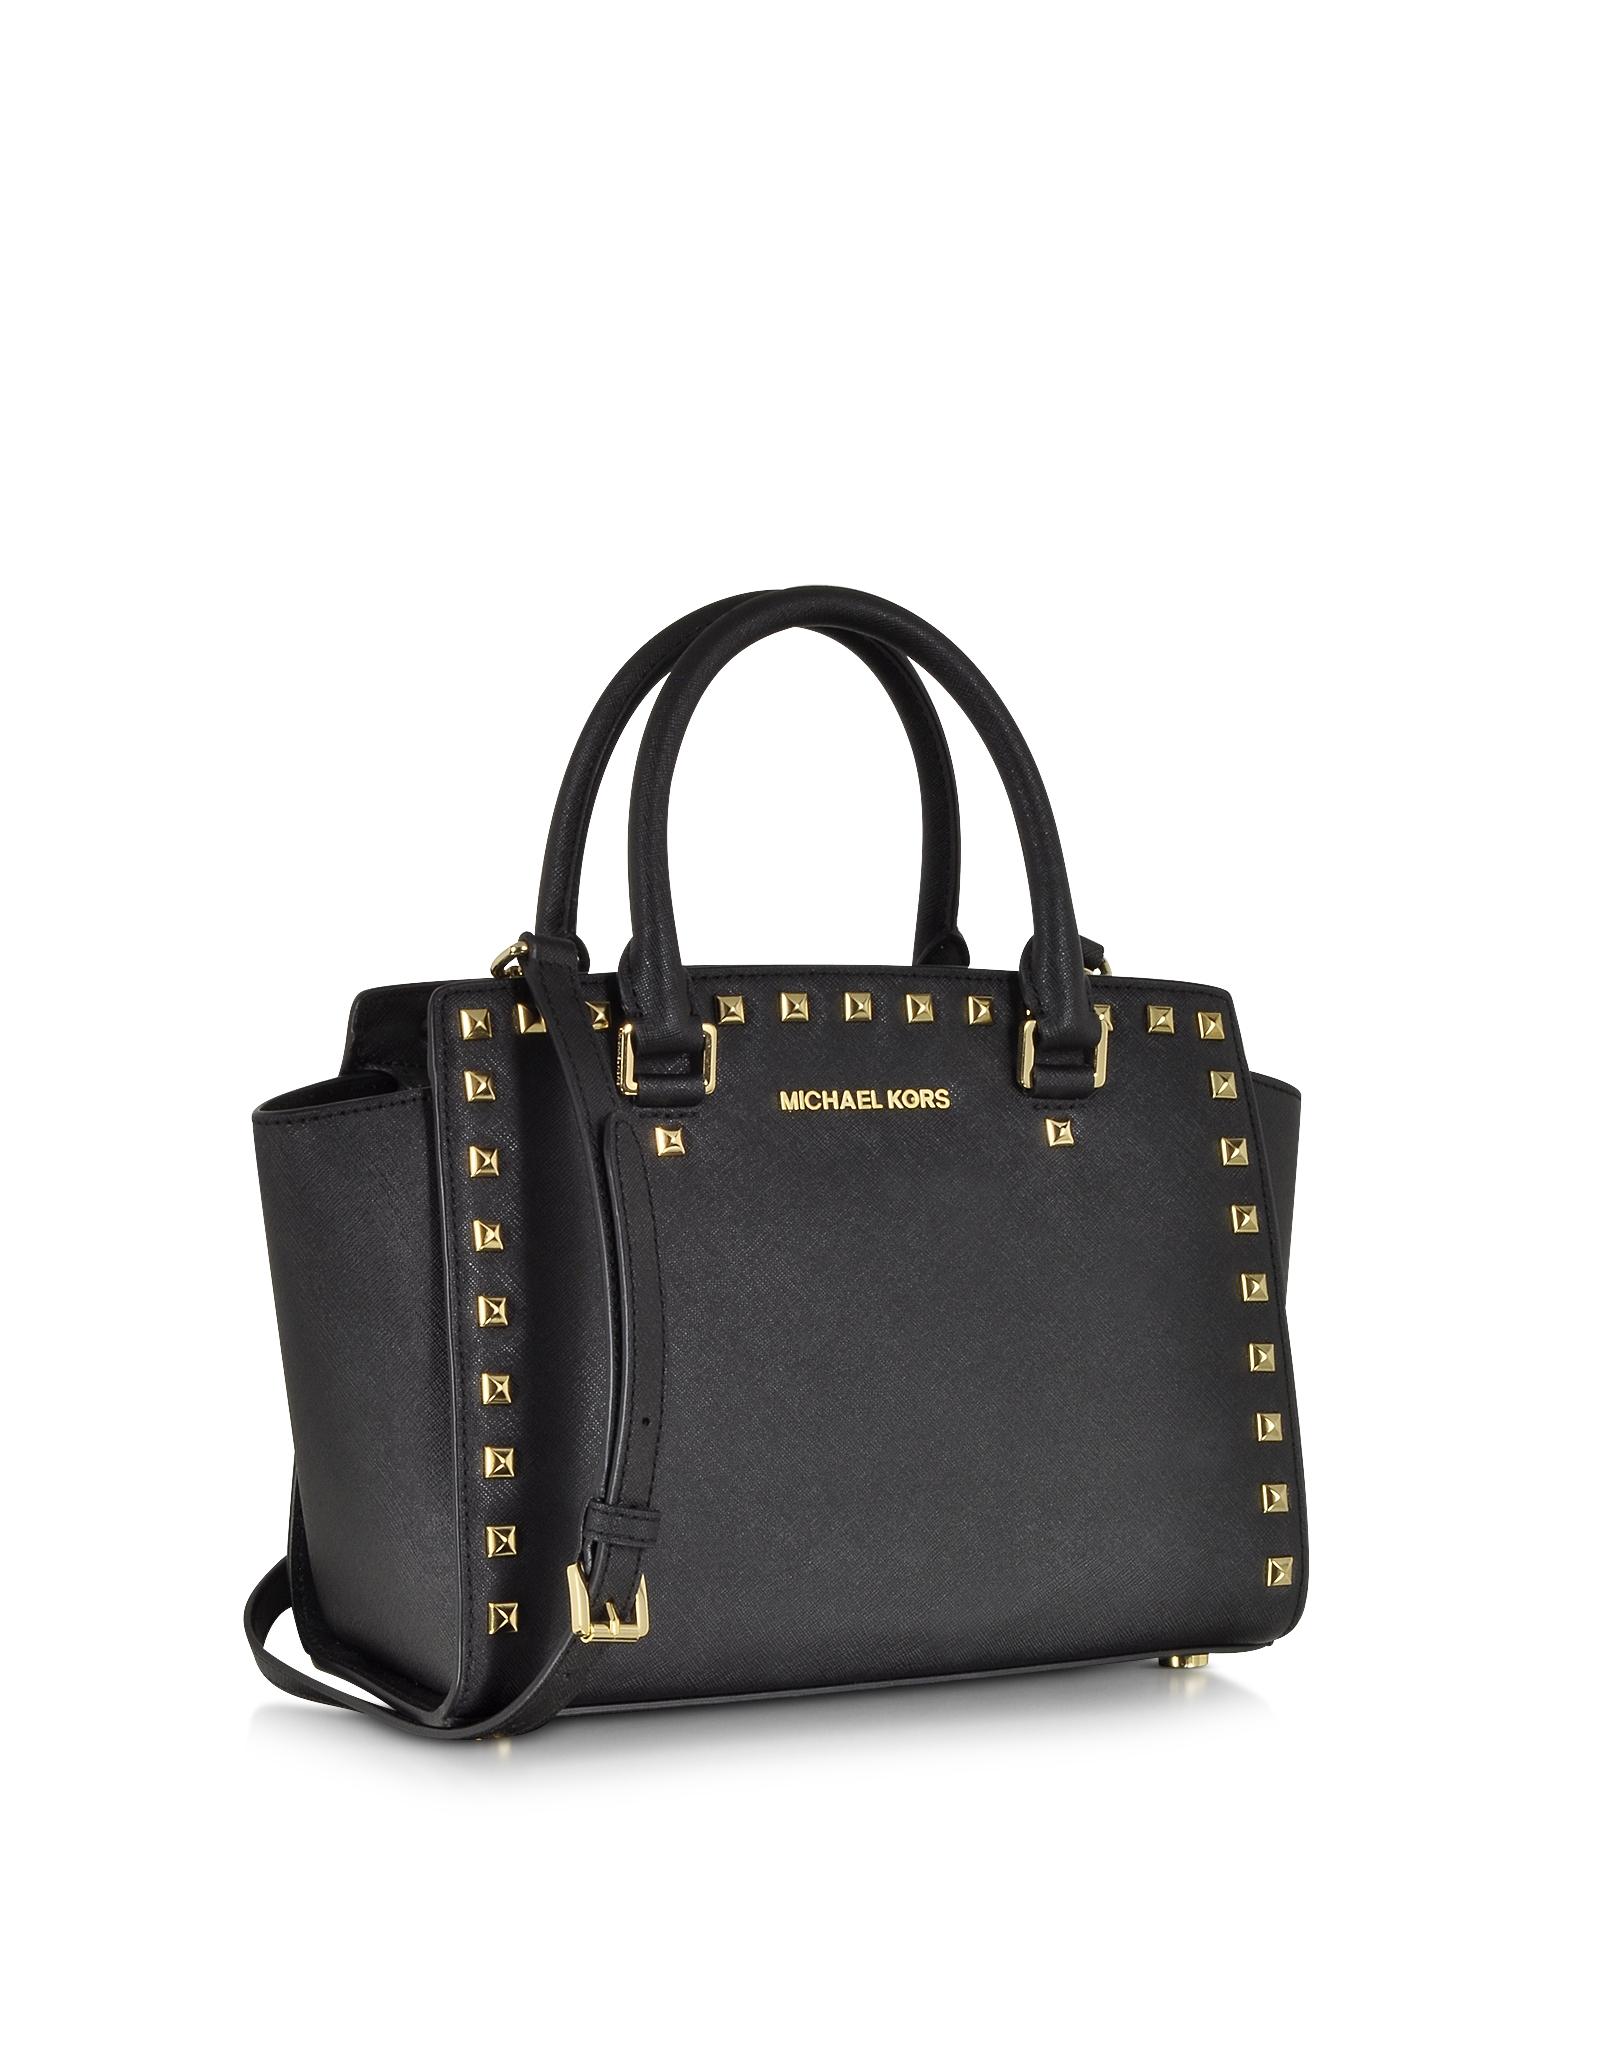 283b590335ff ... medium messenger bag black one size 0f5bf d92ef; authentic gallery.  womens black satchels womens michael by michael kors selma 8eb4c 6b1d5